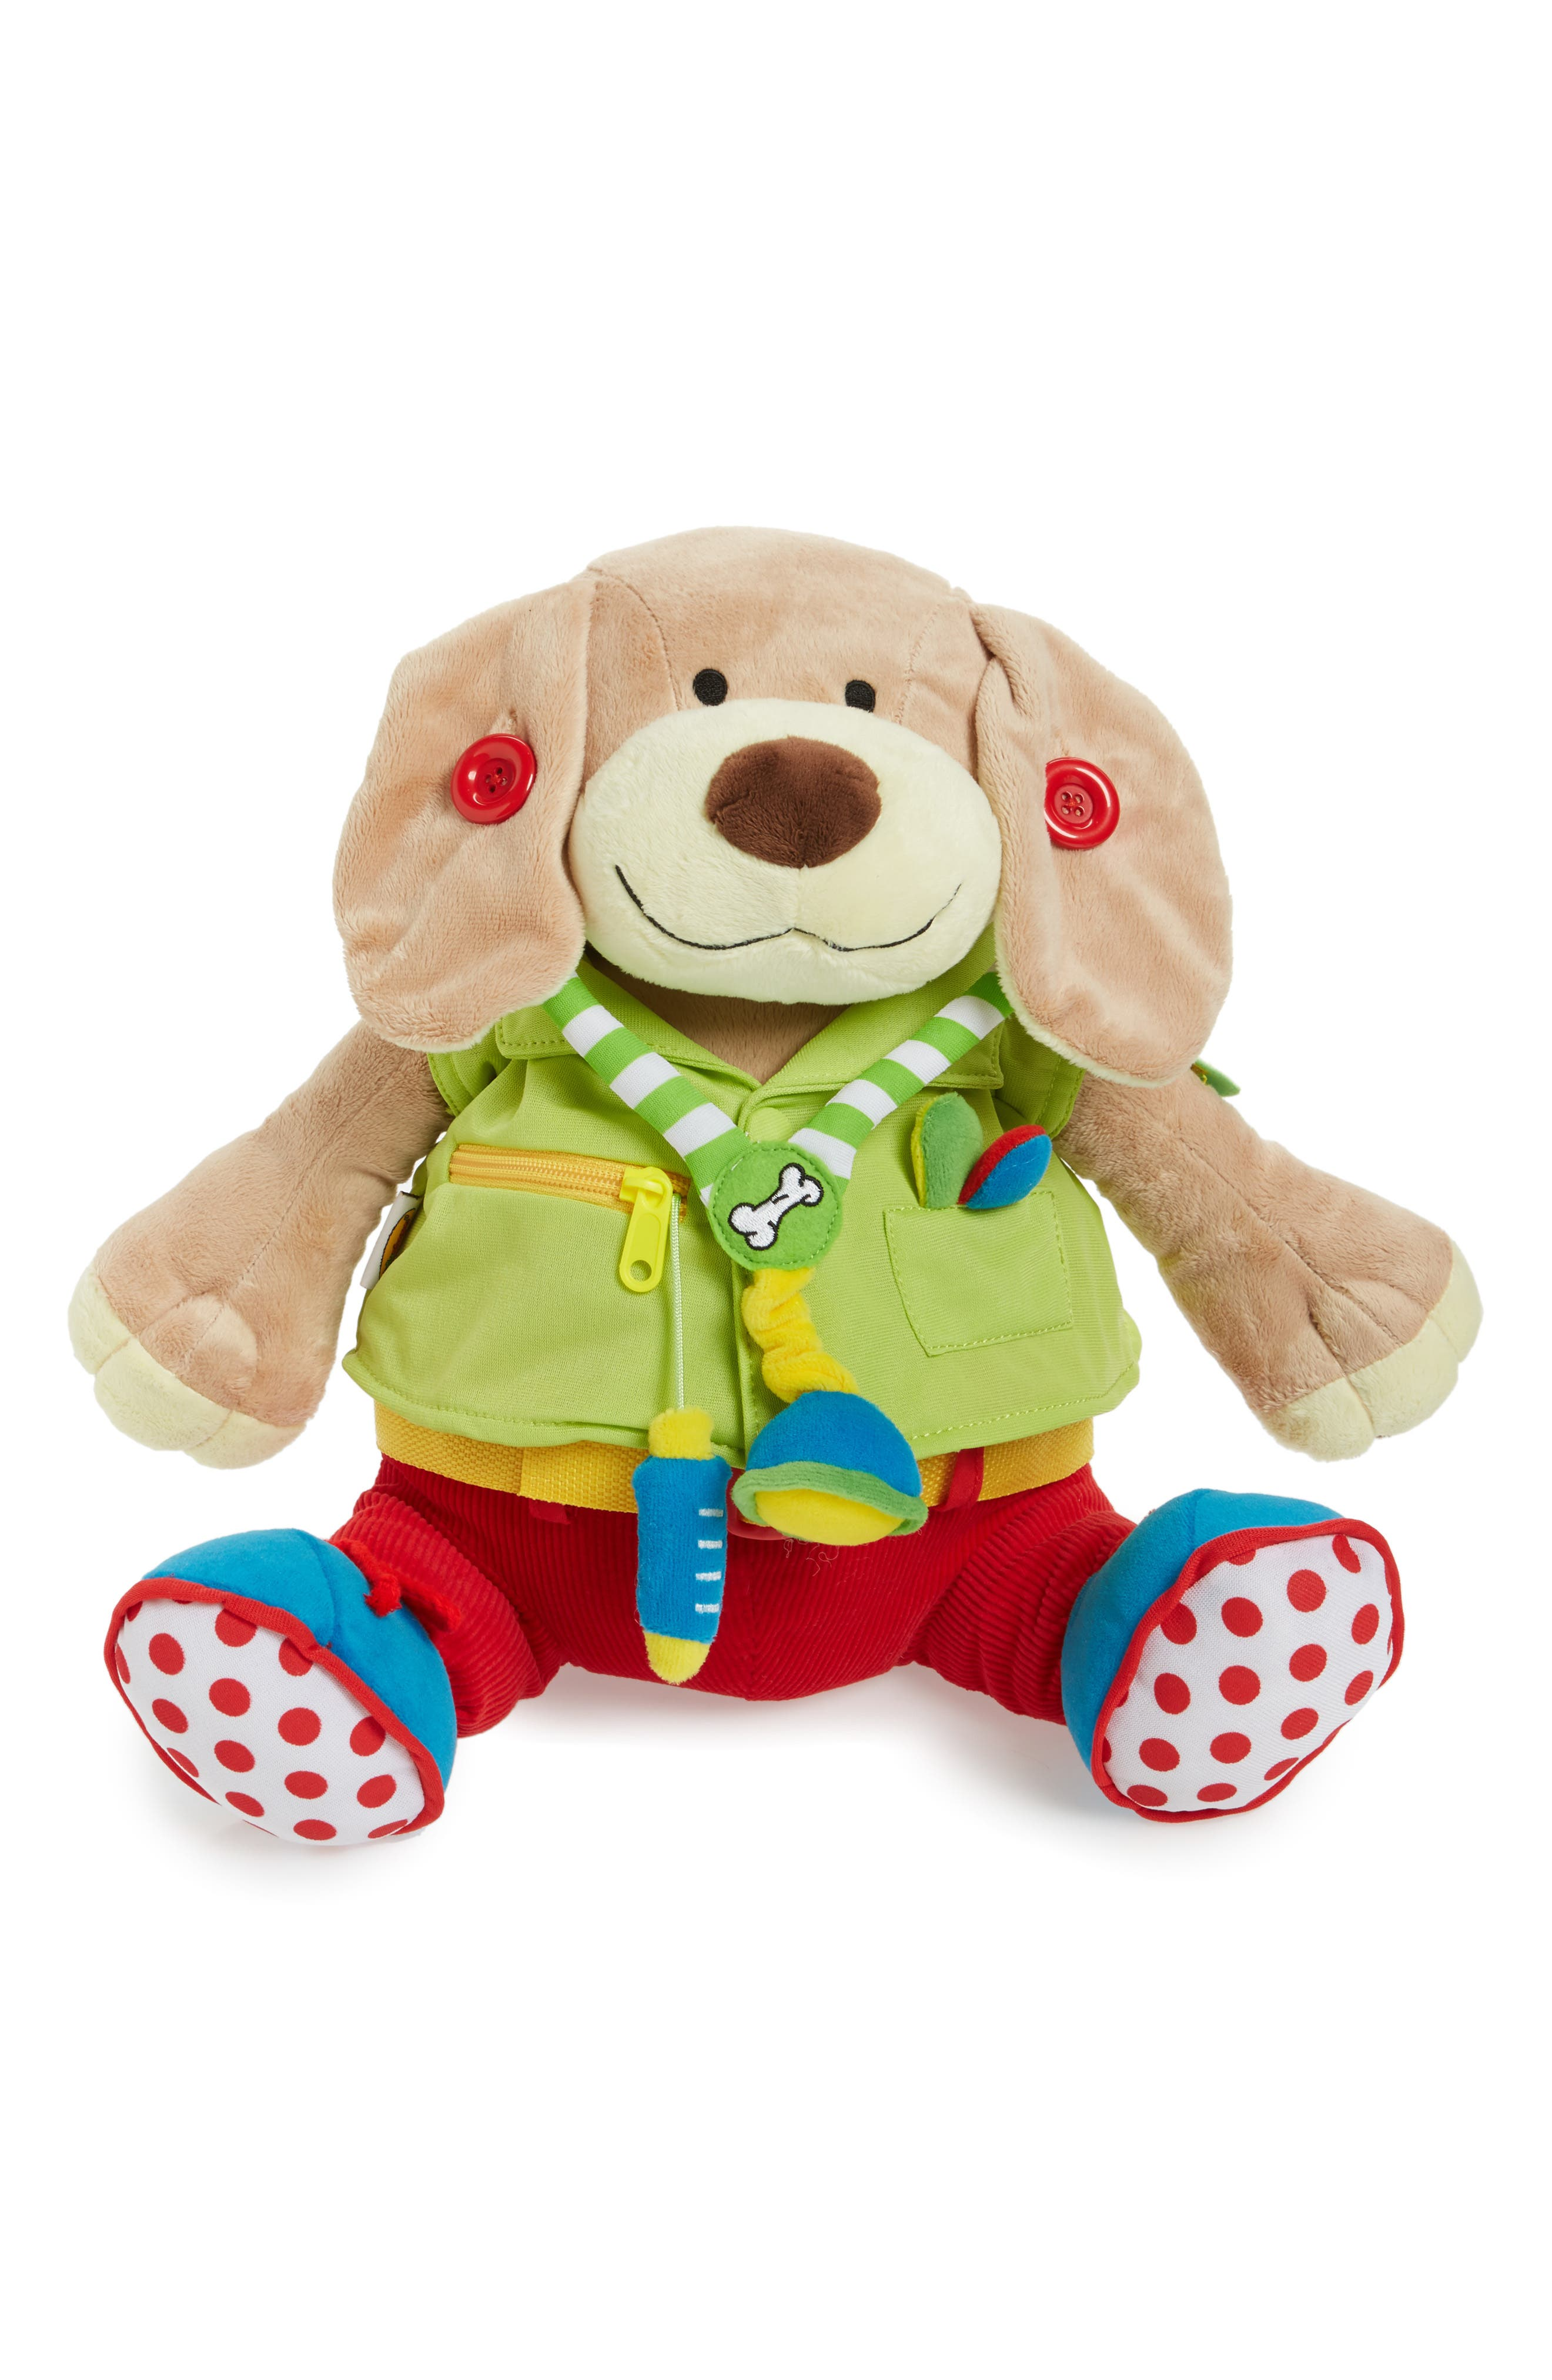 Main Image - edushape Dr Pooch Stuffed Activity Toy